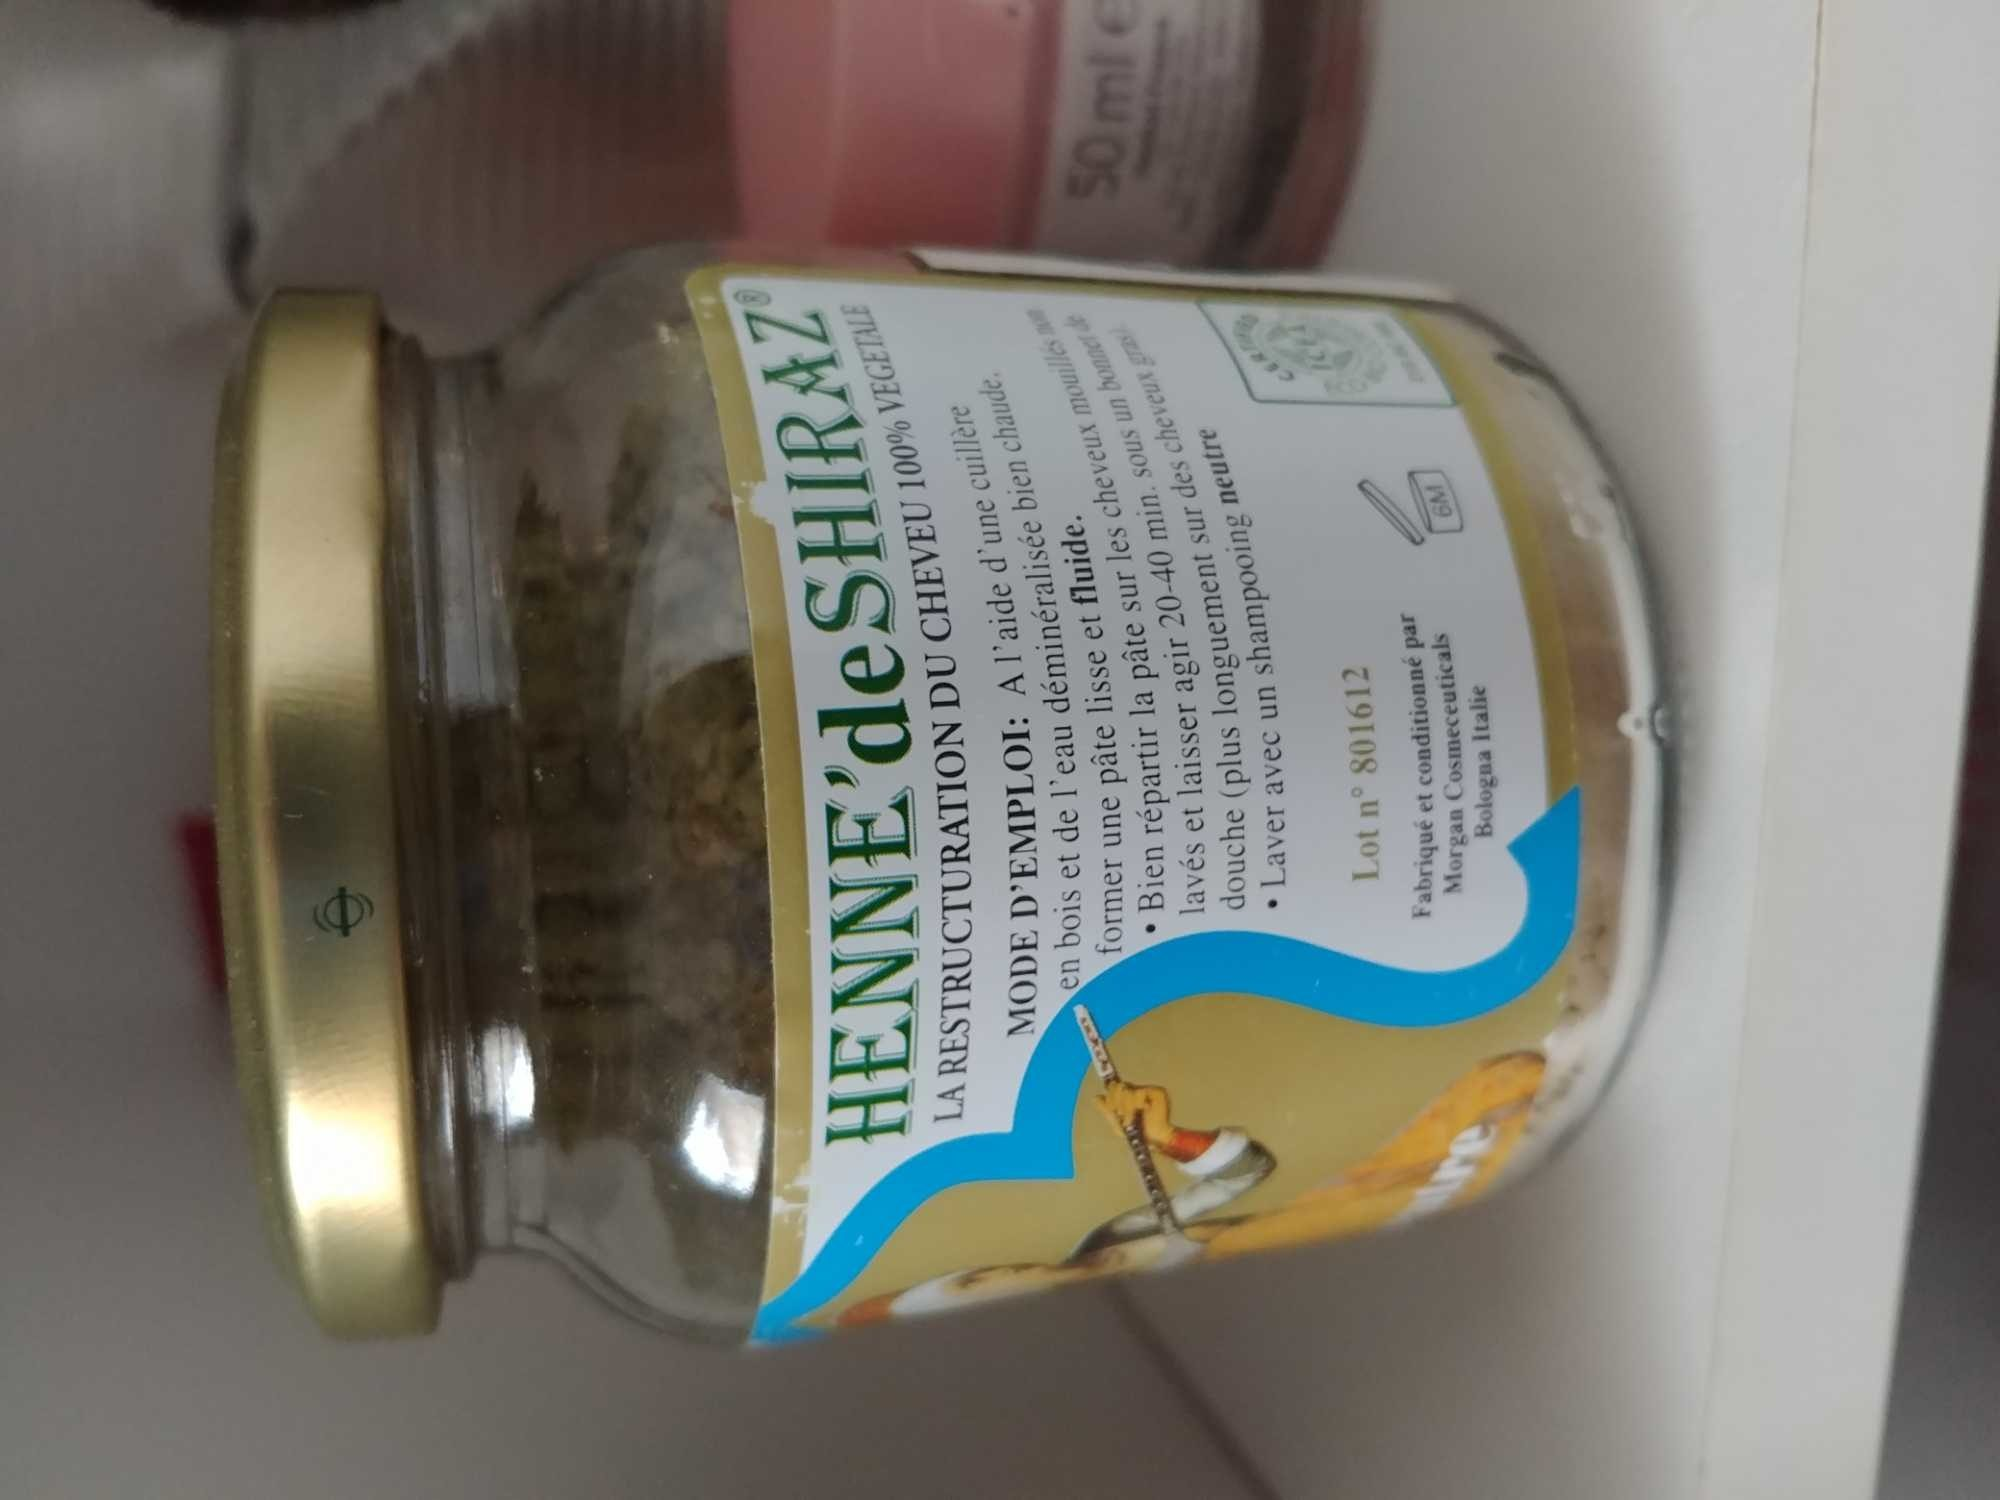 Henne'de shiraz - Product - fr